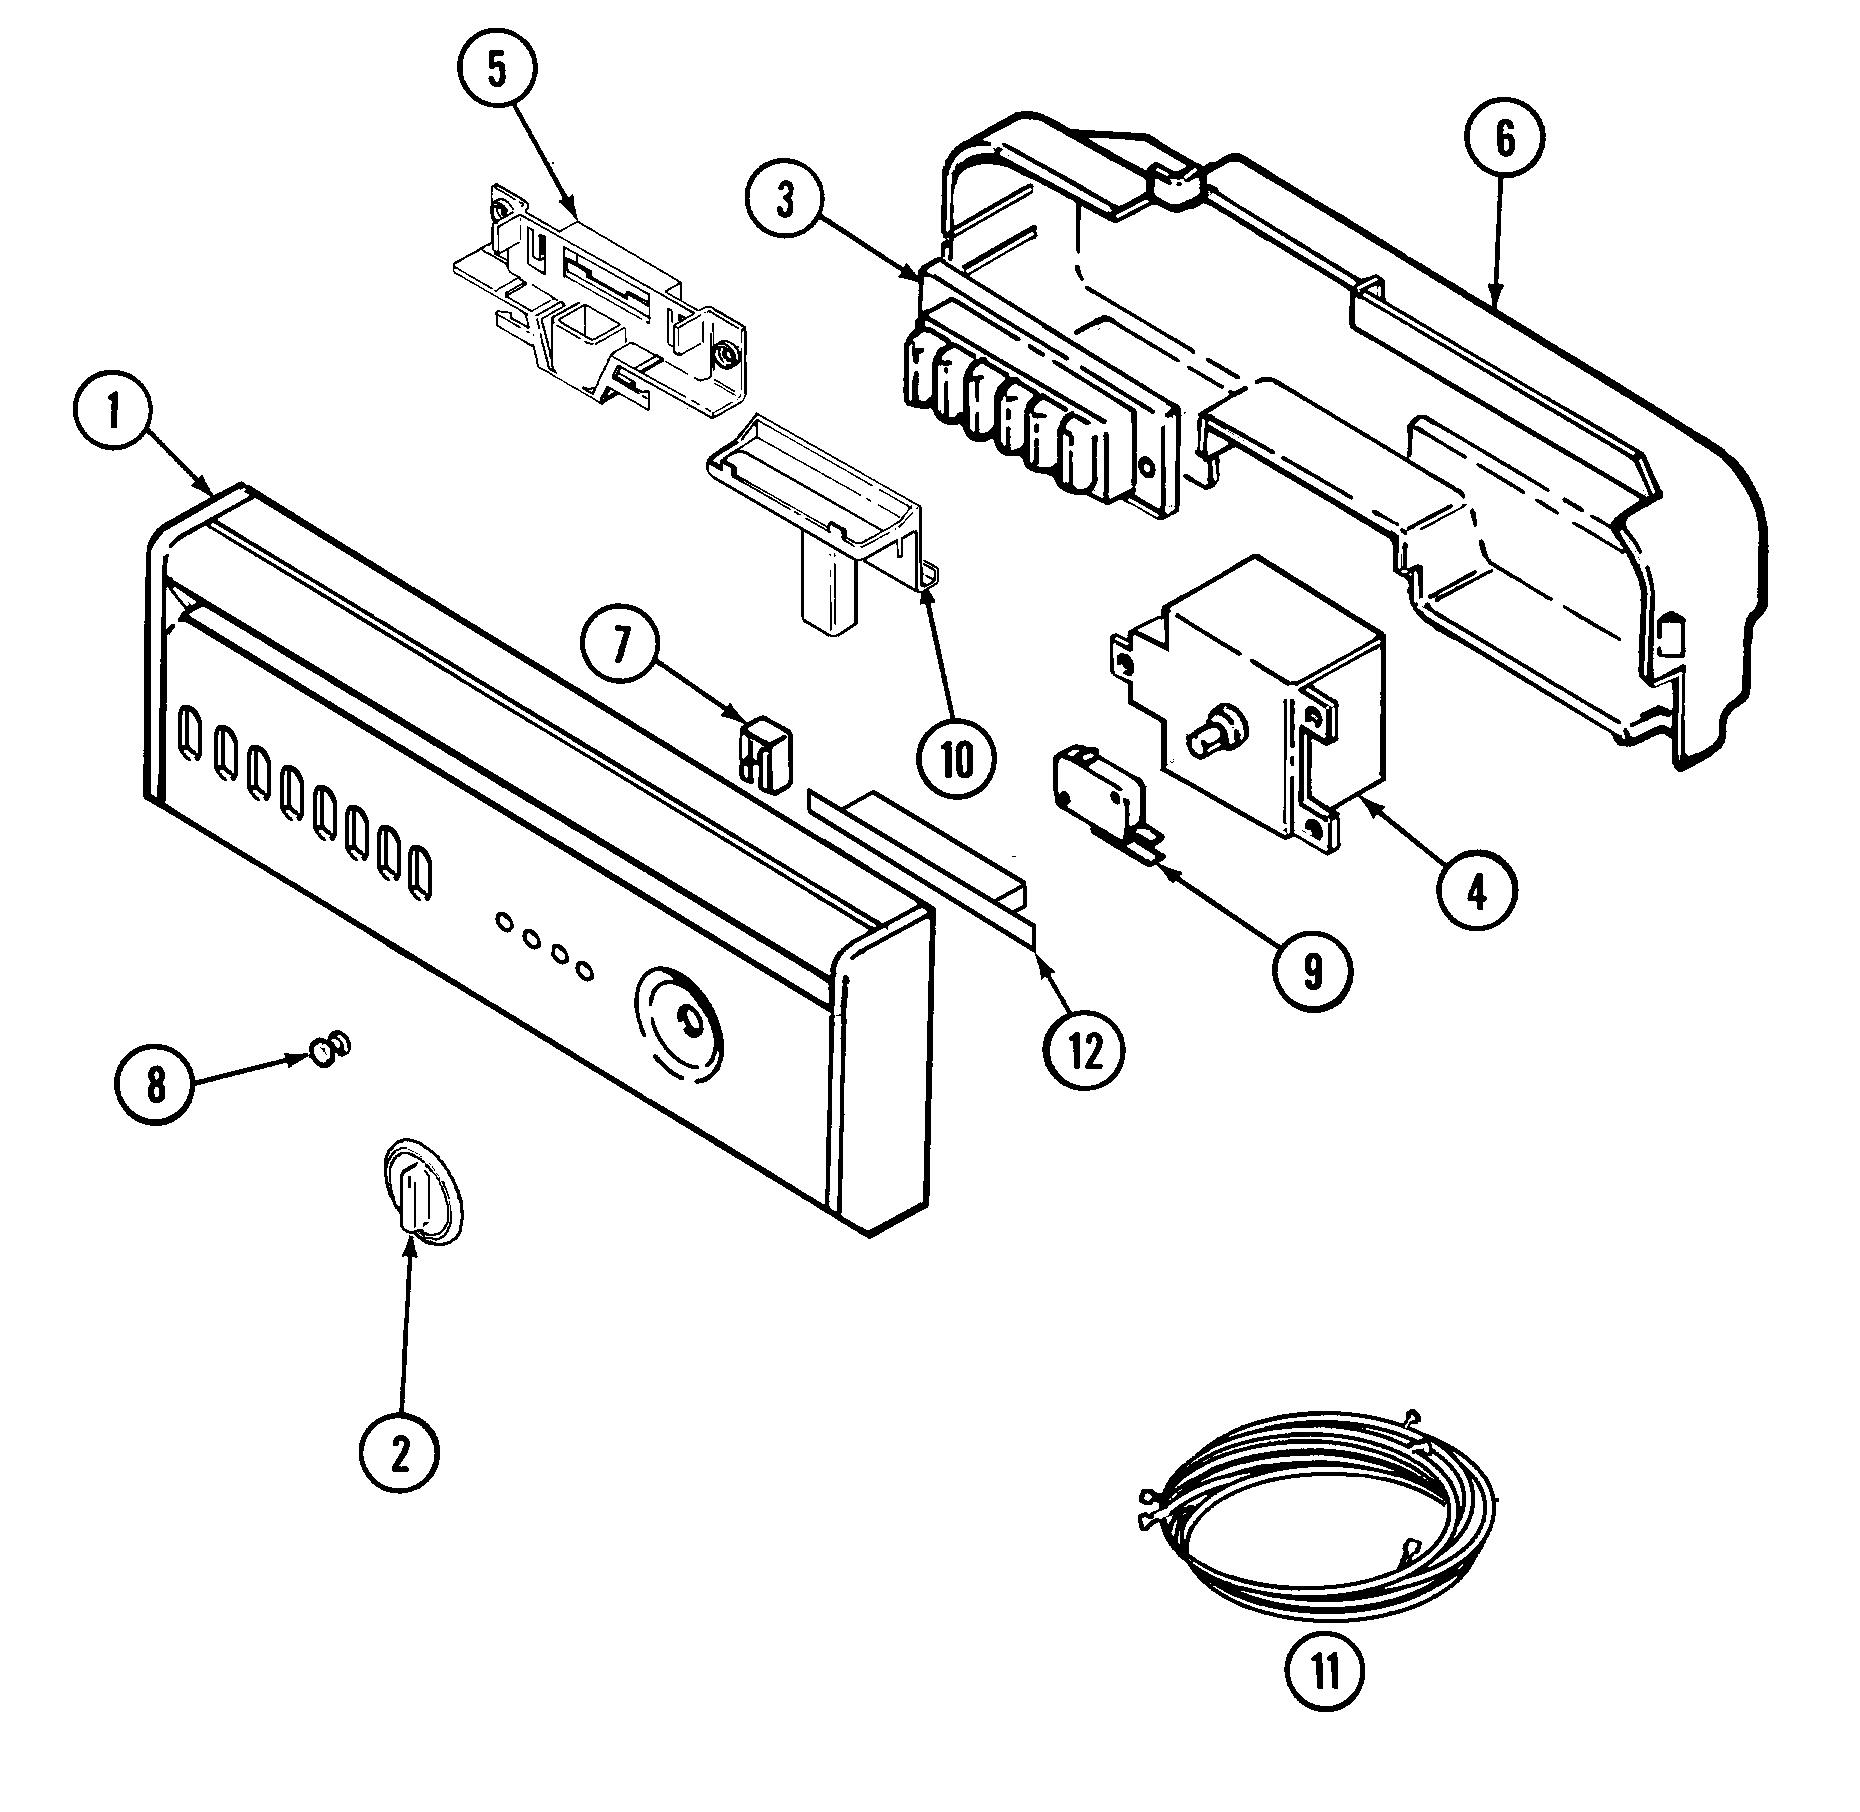 dishwasher wiring diagrams whirlpool diagram seymour duncan maytag mdb6000awa timer stove clocks and appliance timers